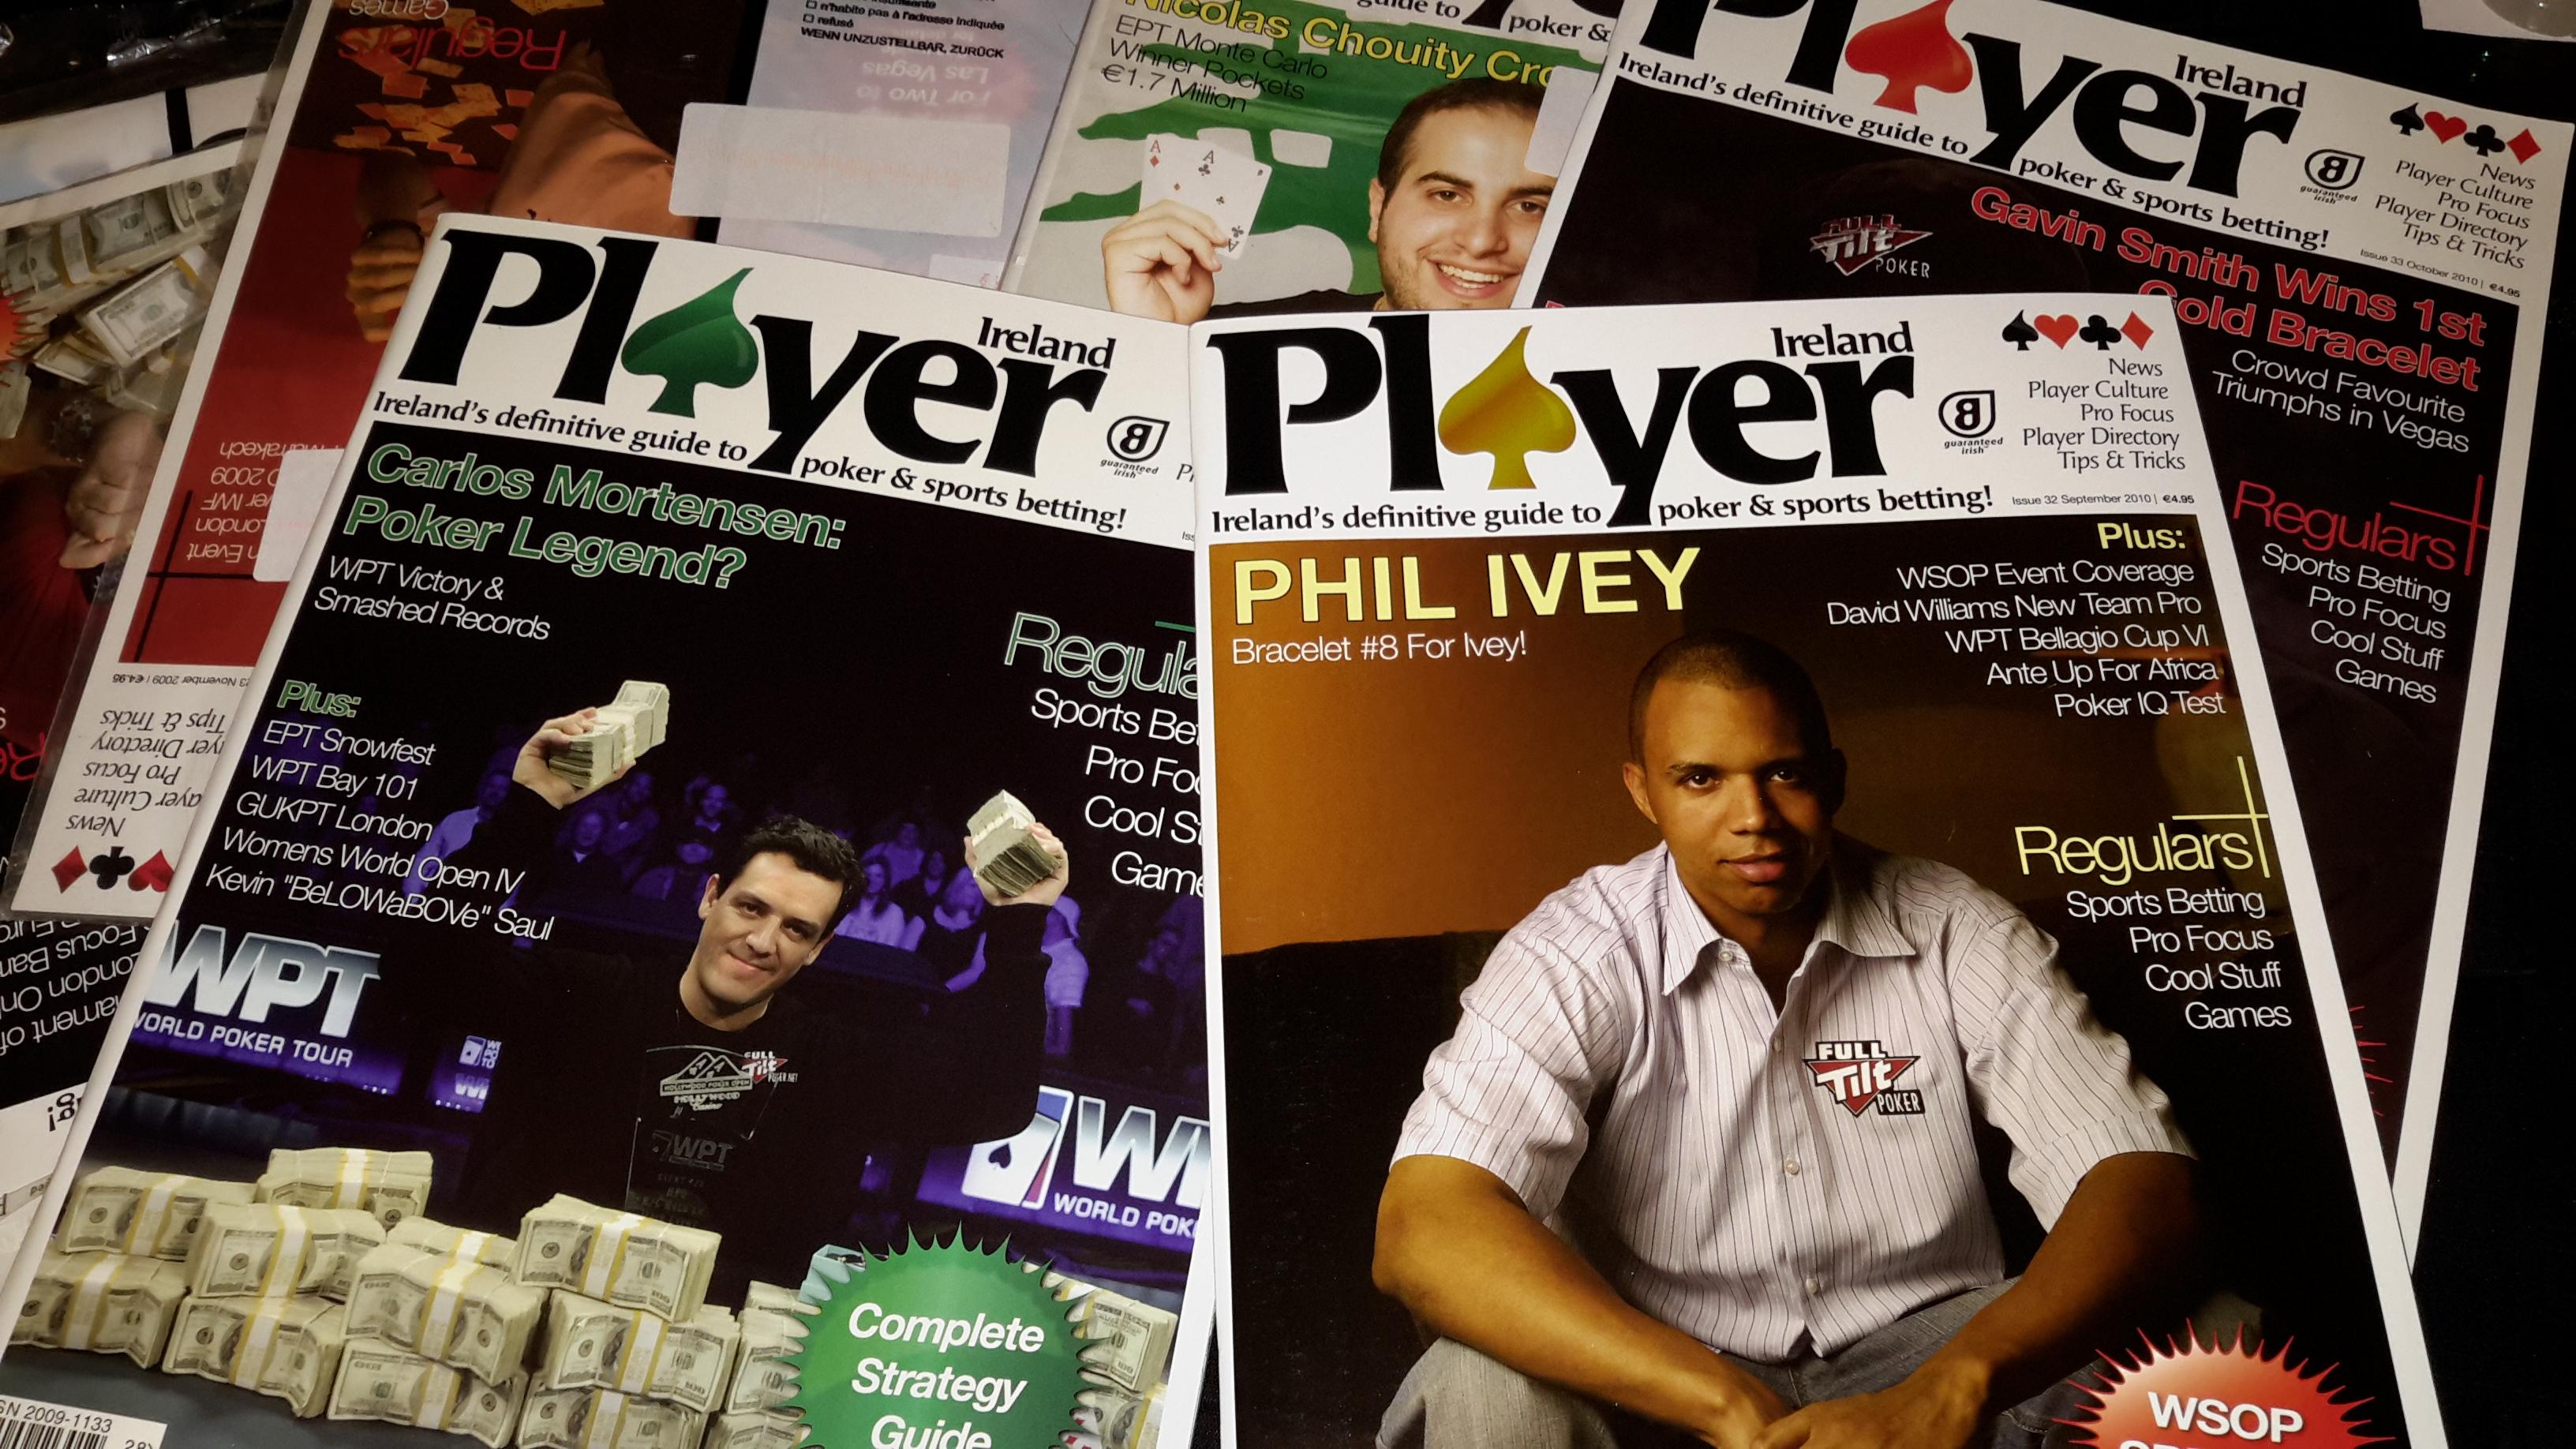 Poker Ireland Mag